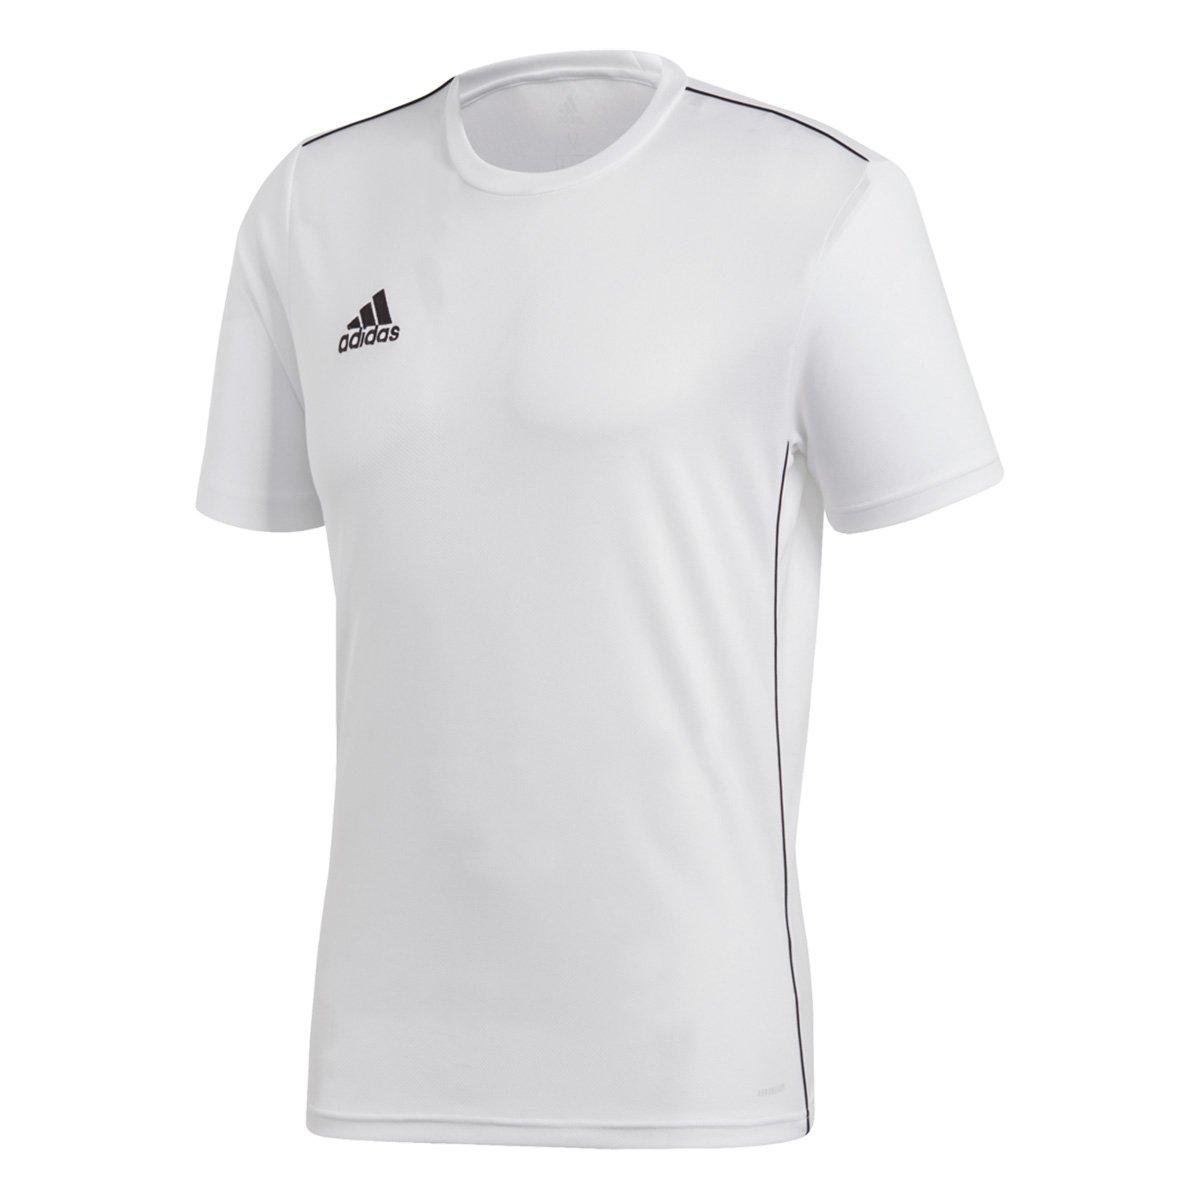 Camiseta Adidas Core 18 Masculina - Branco e Preto - Compre Agora ... 570b374309e